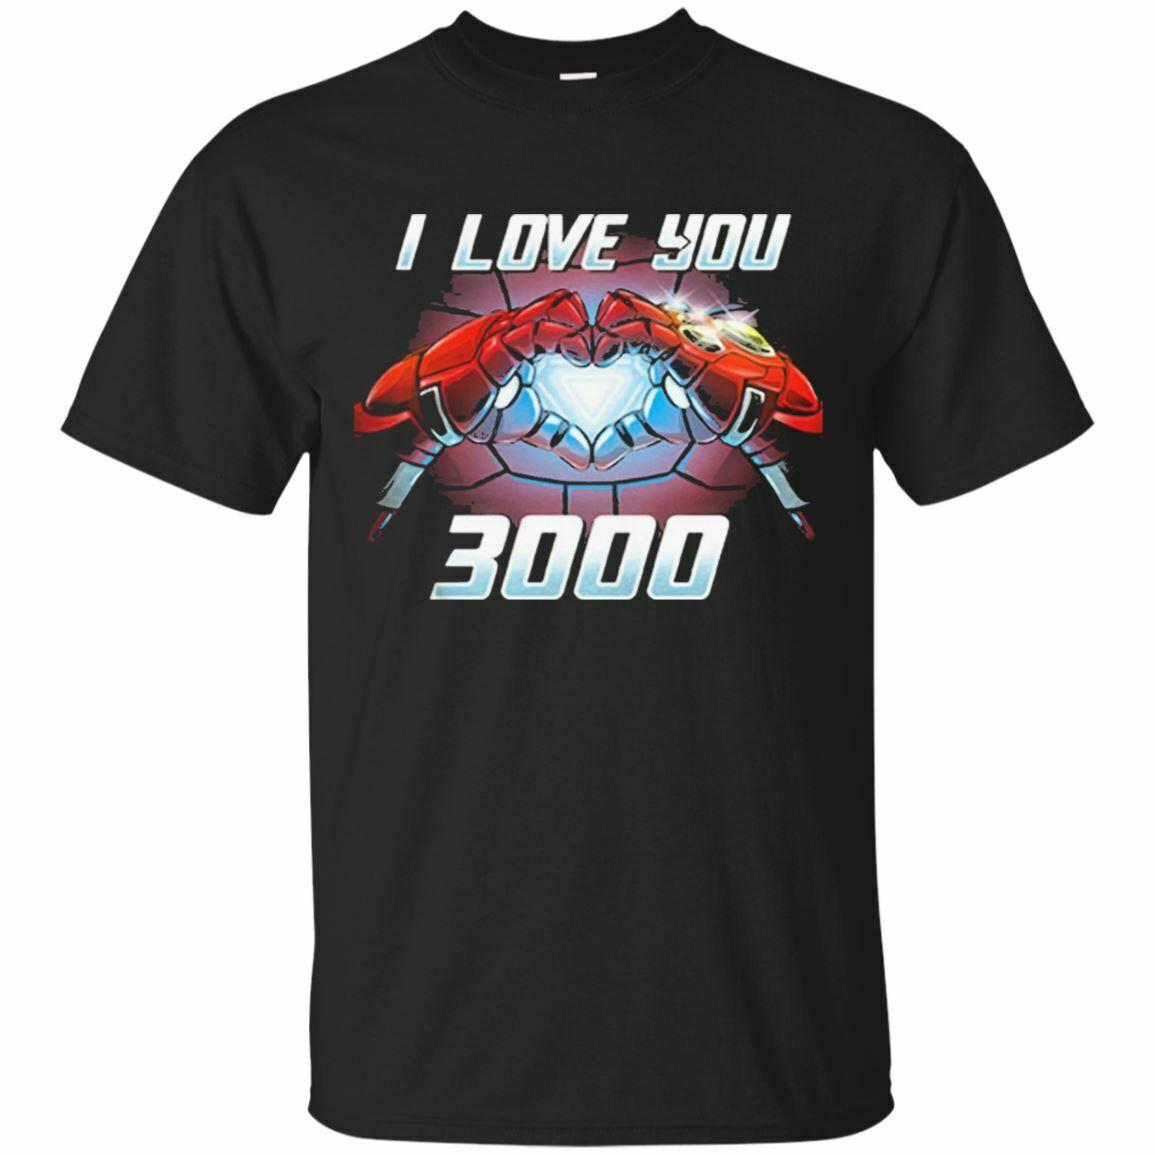 love you 3000 Times Iron Man Avengers Endgame   T     Shirt   Short Black-Navy Unisex